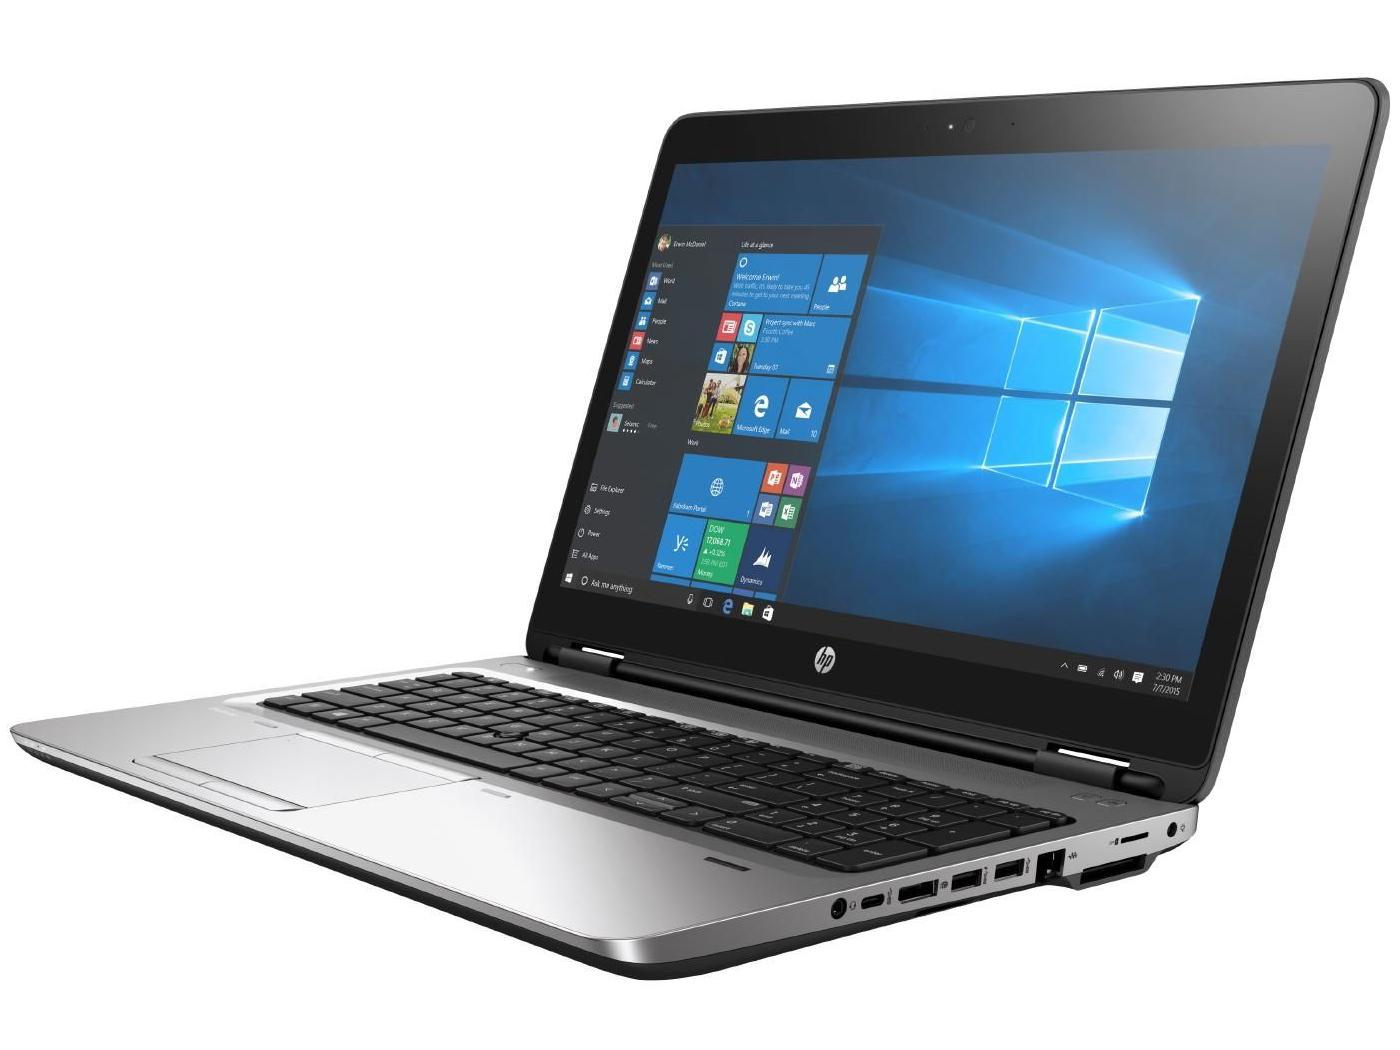 Drivers Update: Acer Aspire 7740 Notebook Broadcom Bluetooth